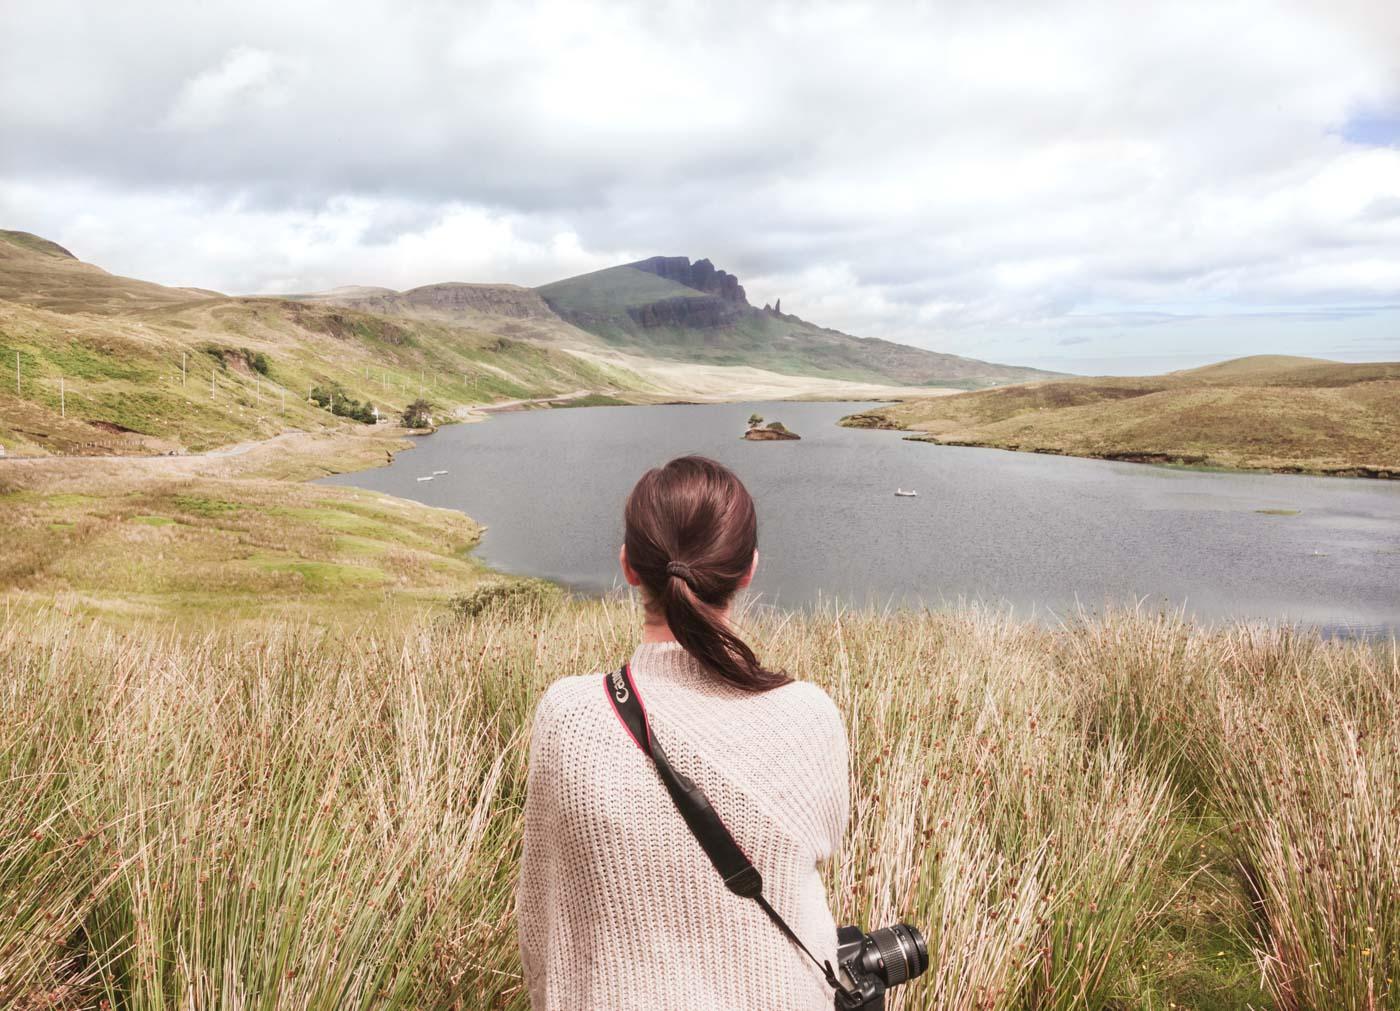 Szkocja, Isle of Skye, widok na Old Man of Storr